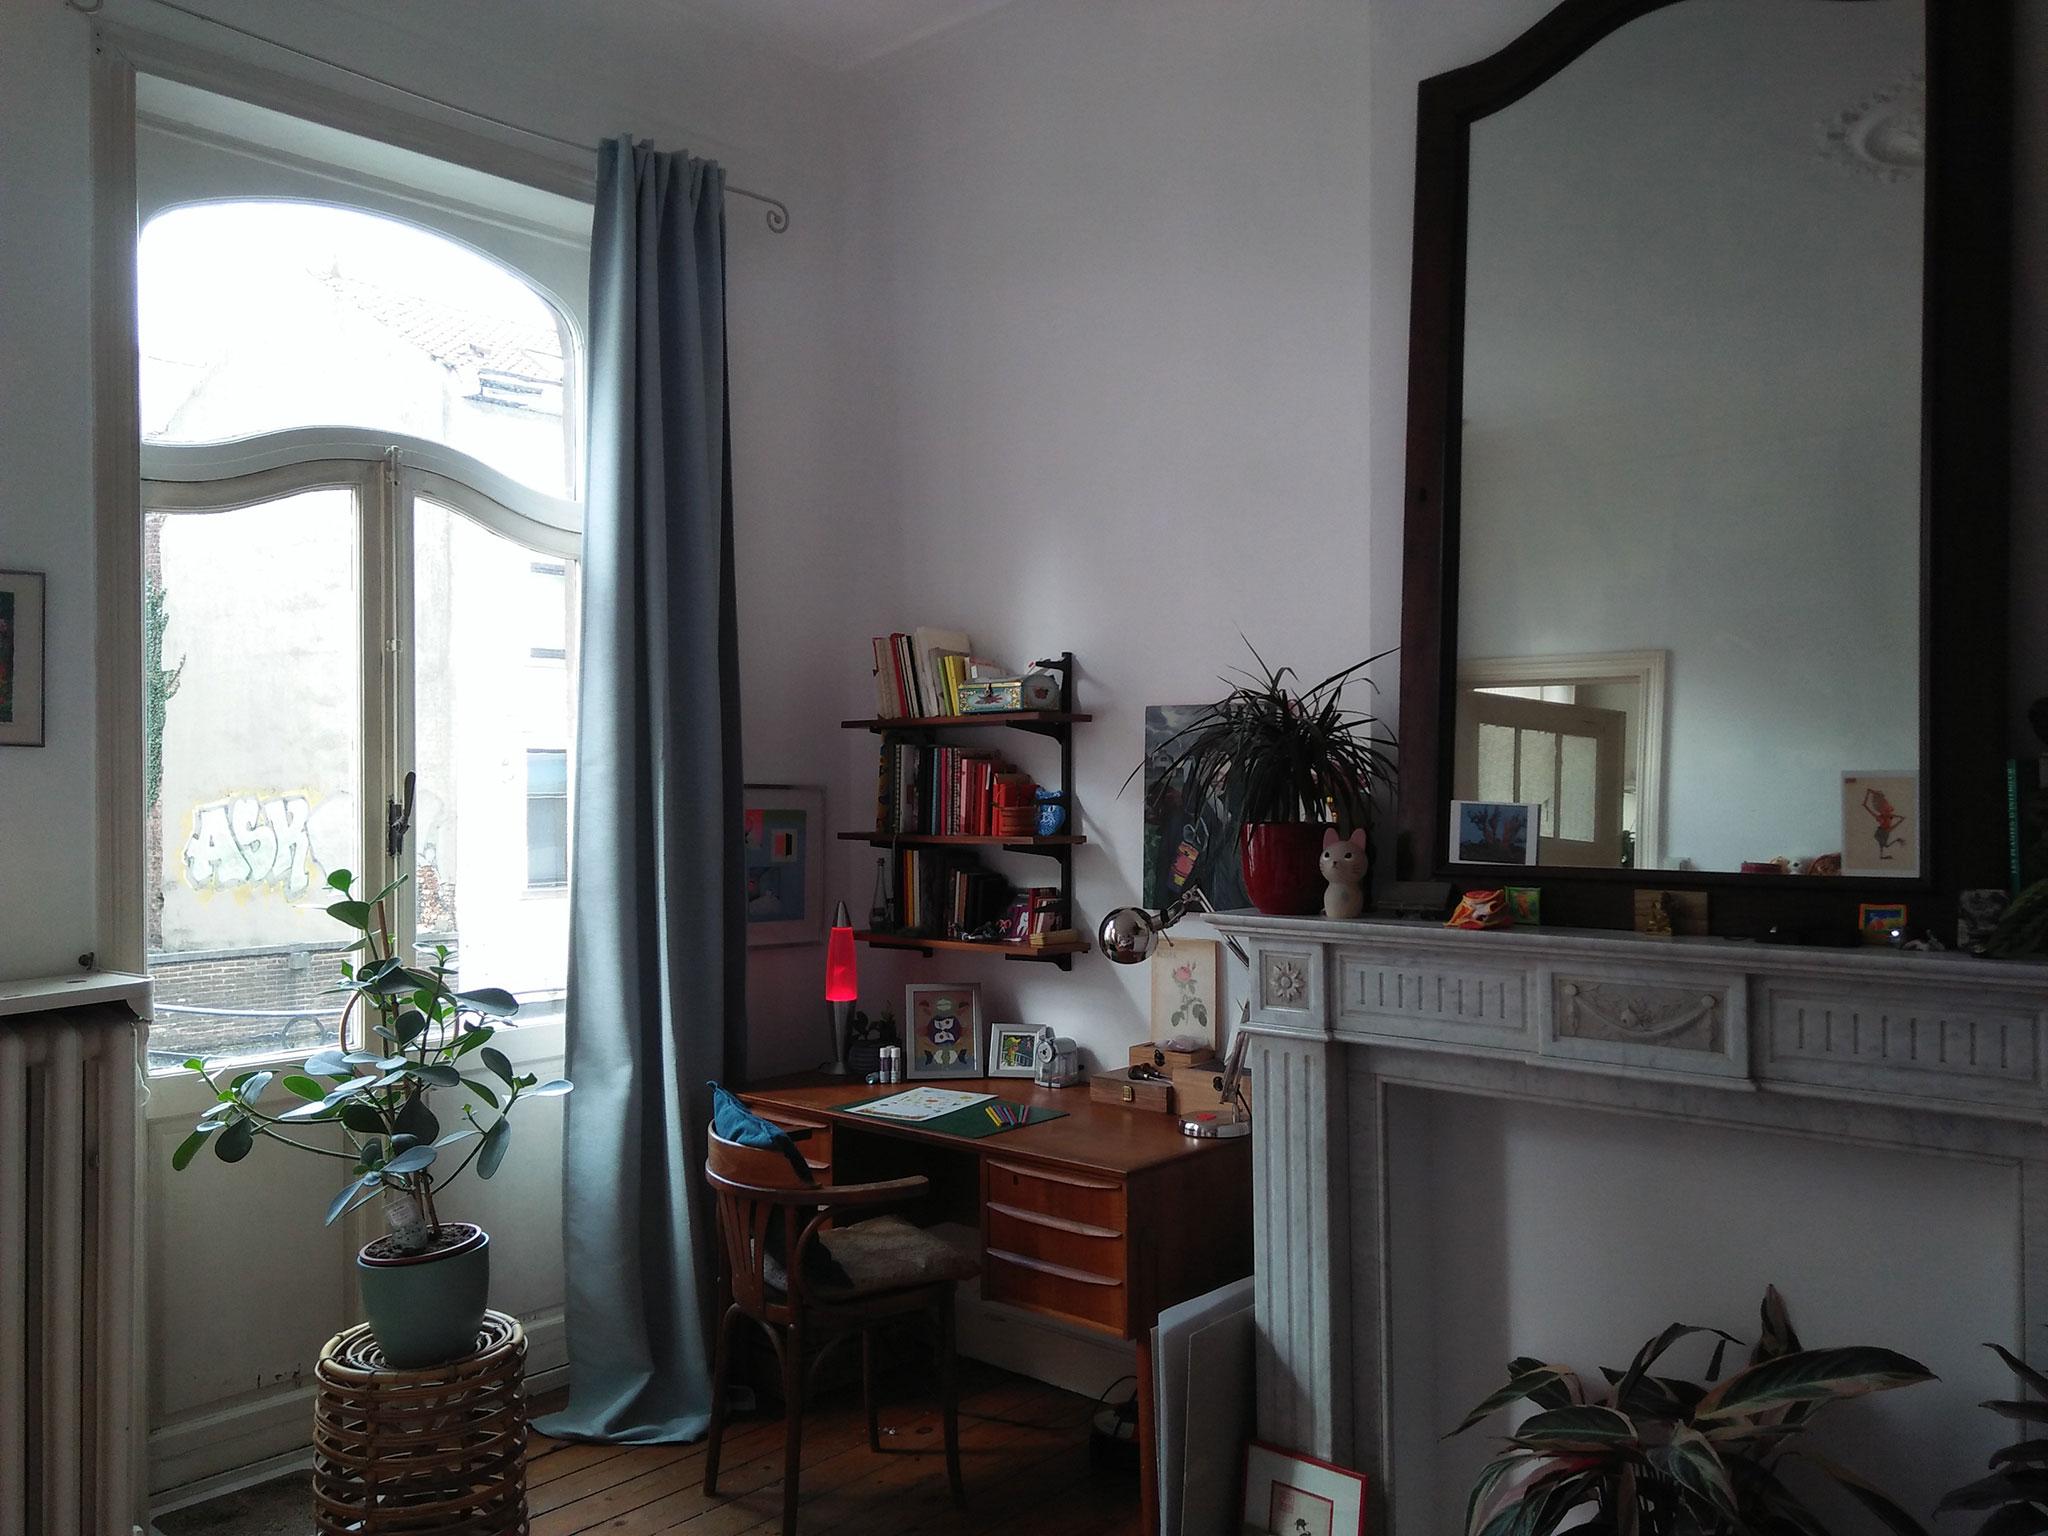 Nausicaa-Gournay-3--Auteurs-a-la-maison---BDAIX